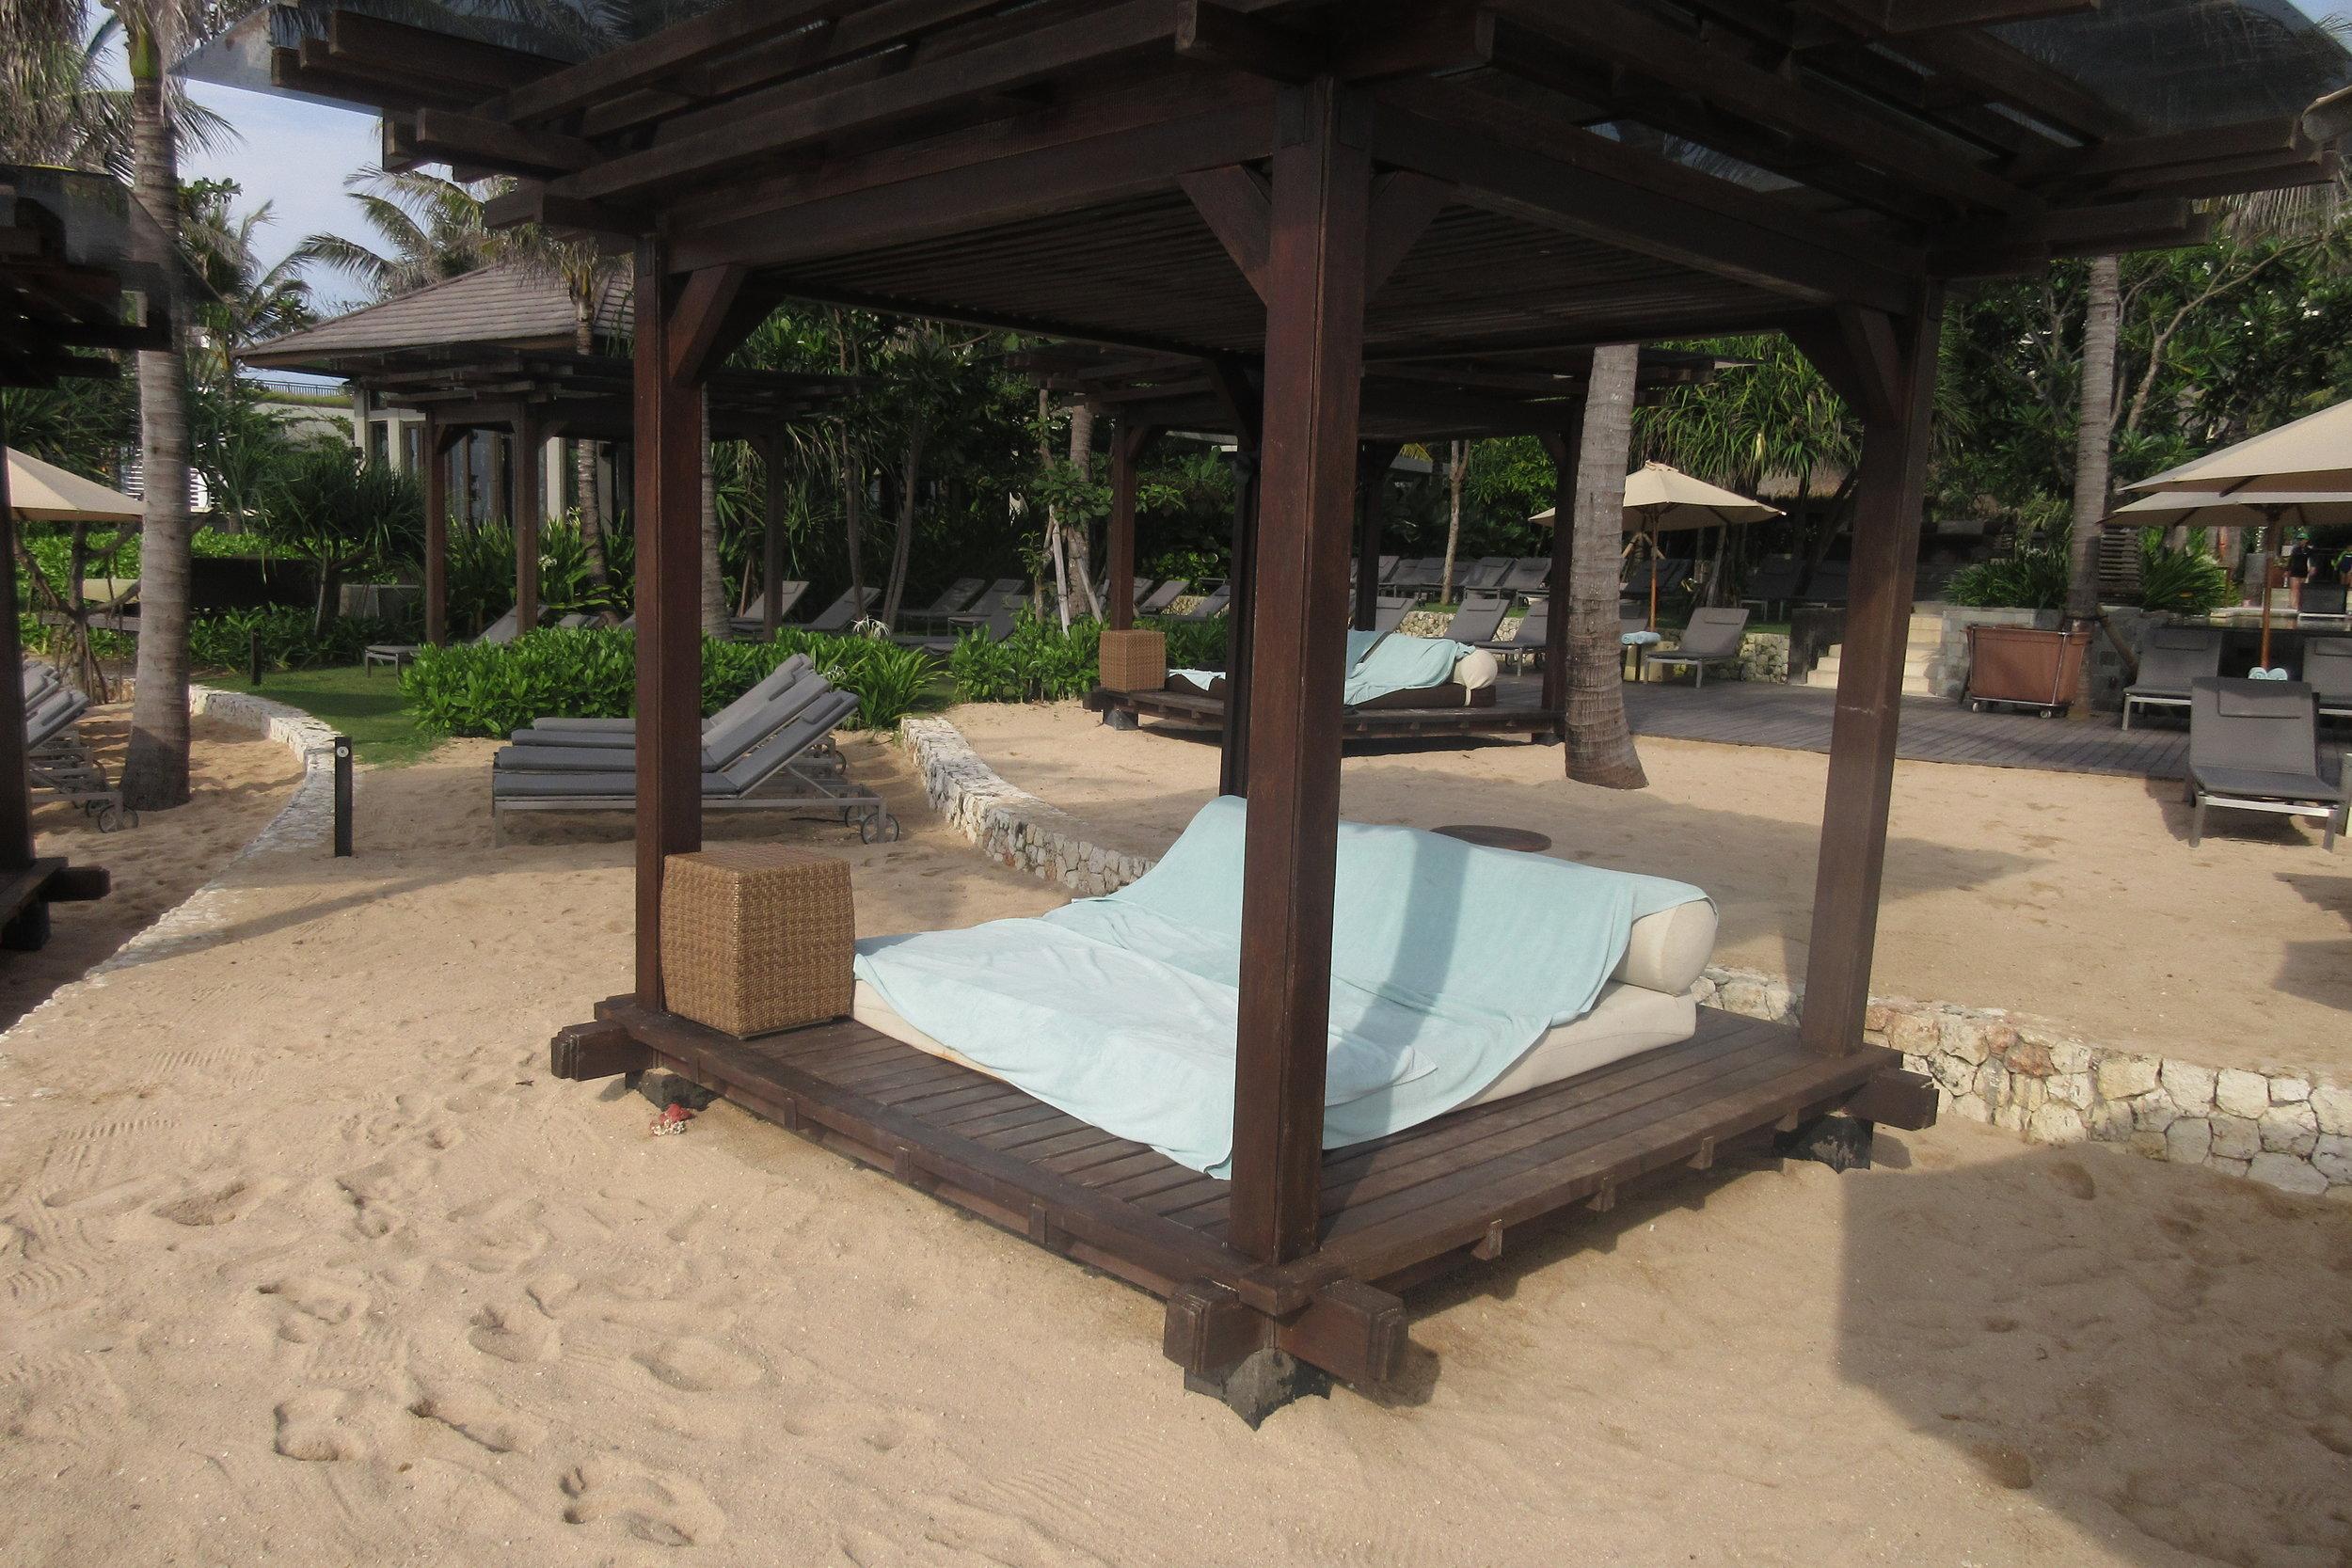 The Ritz-Carlton, Bali – Beach cabanas